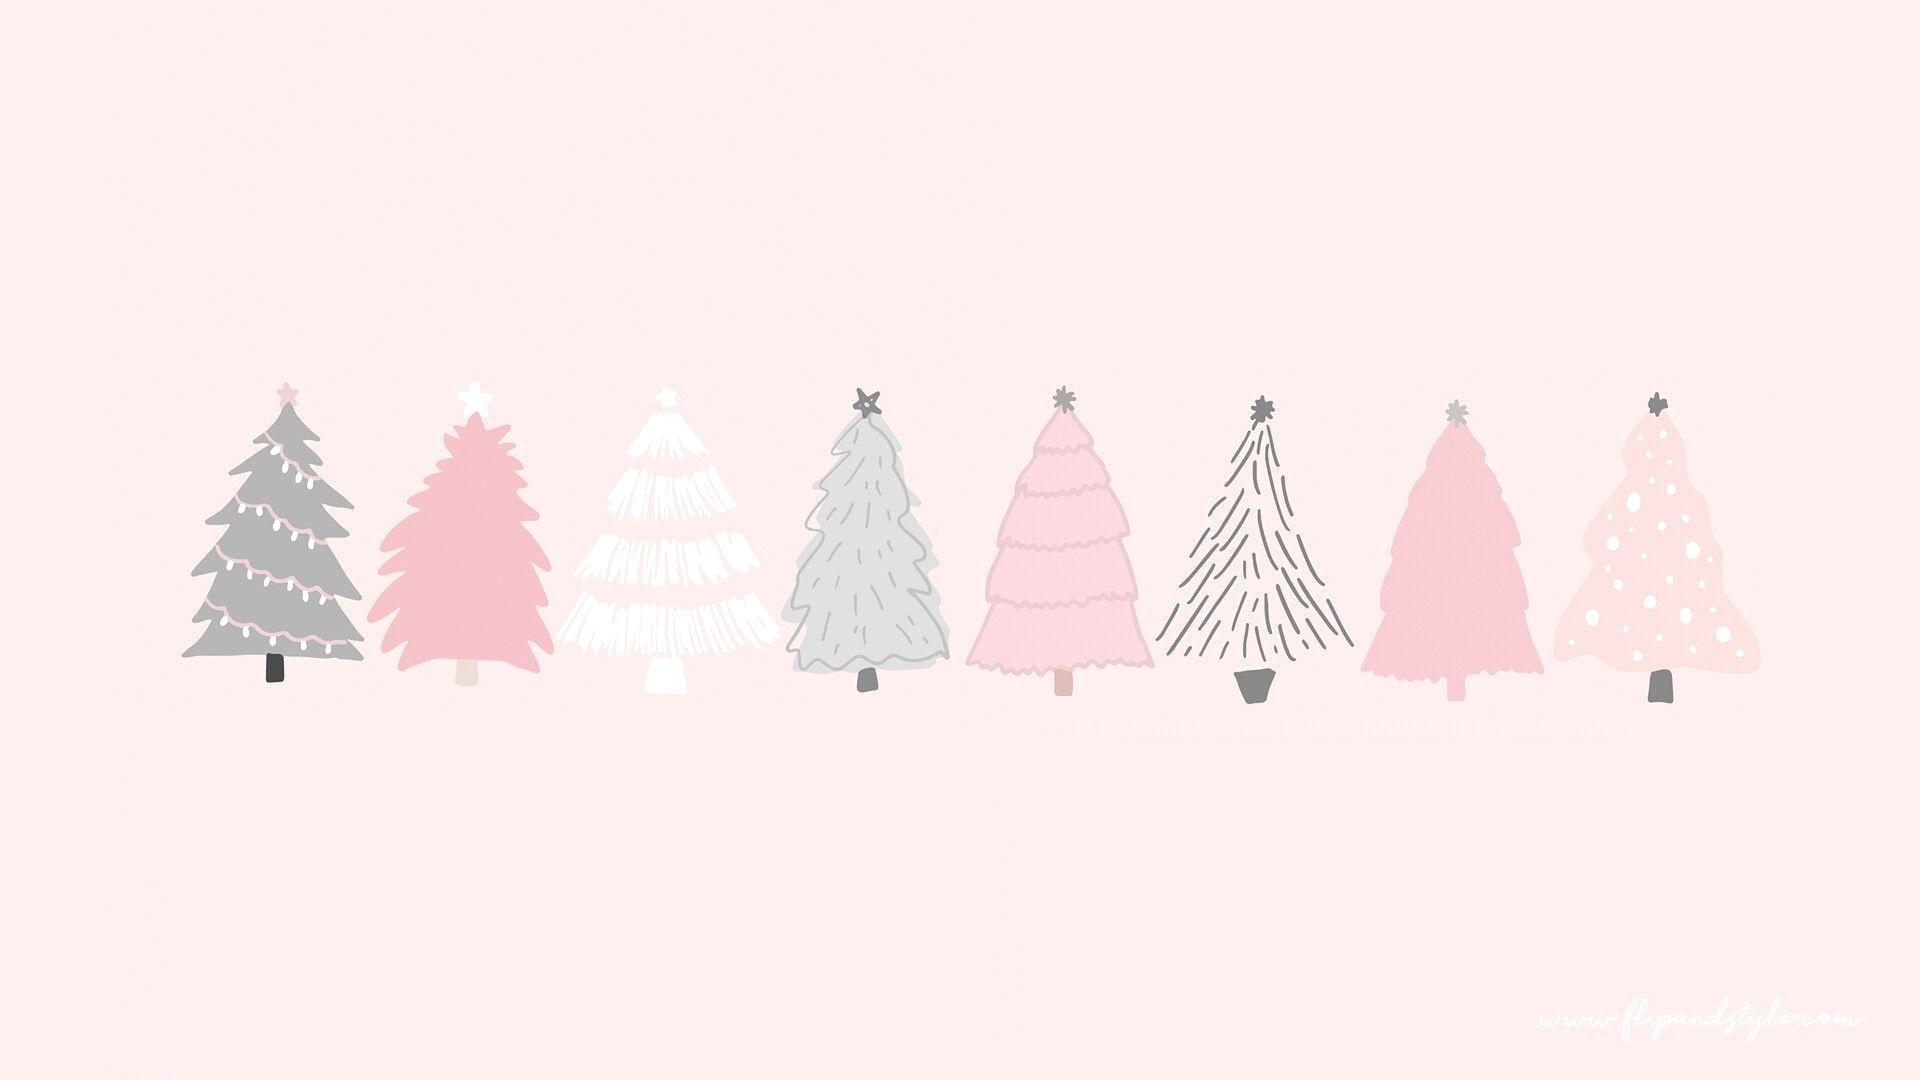 Cute Christmas Tree Desktop Wallpaper Ideas Christmas Desktop Wallpaper Free Wallpaper Backgrounds Wallpaper Iphone Christmas